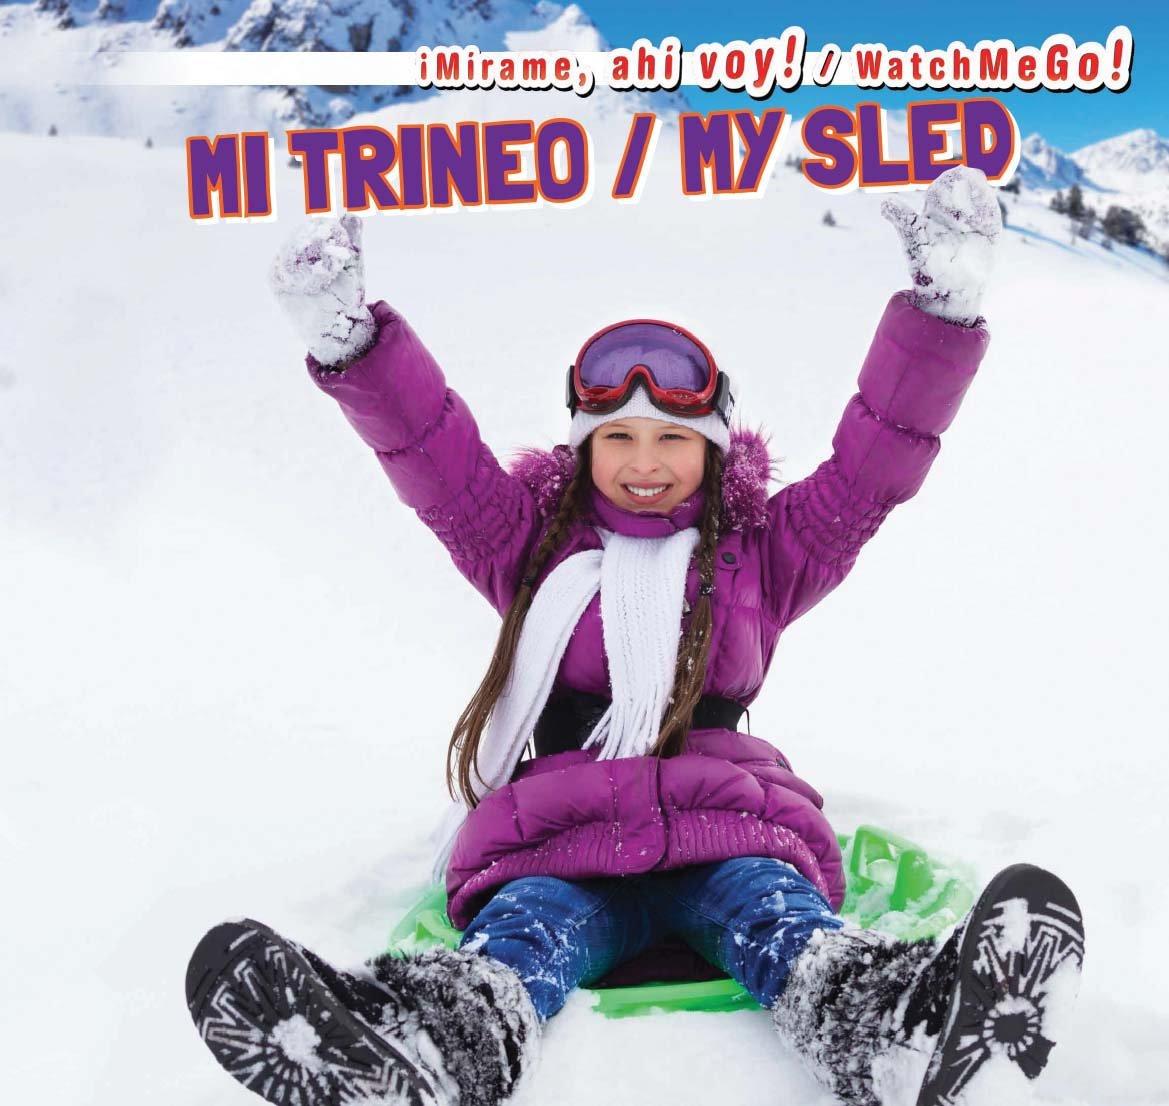 Mi Trineo / My Sled (Mirame, Ahi Voy! / Watch Me Go!) (Spanish and English Edition)